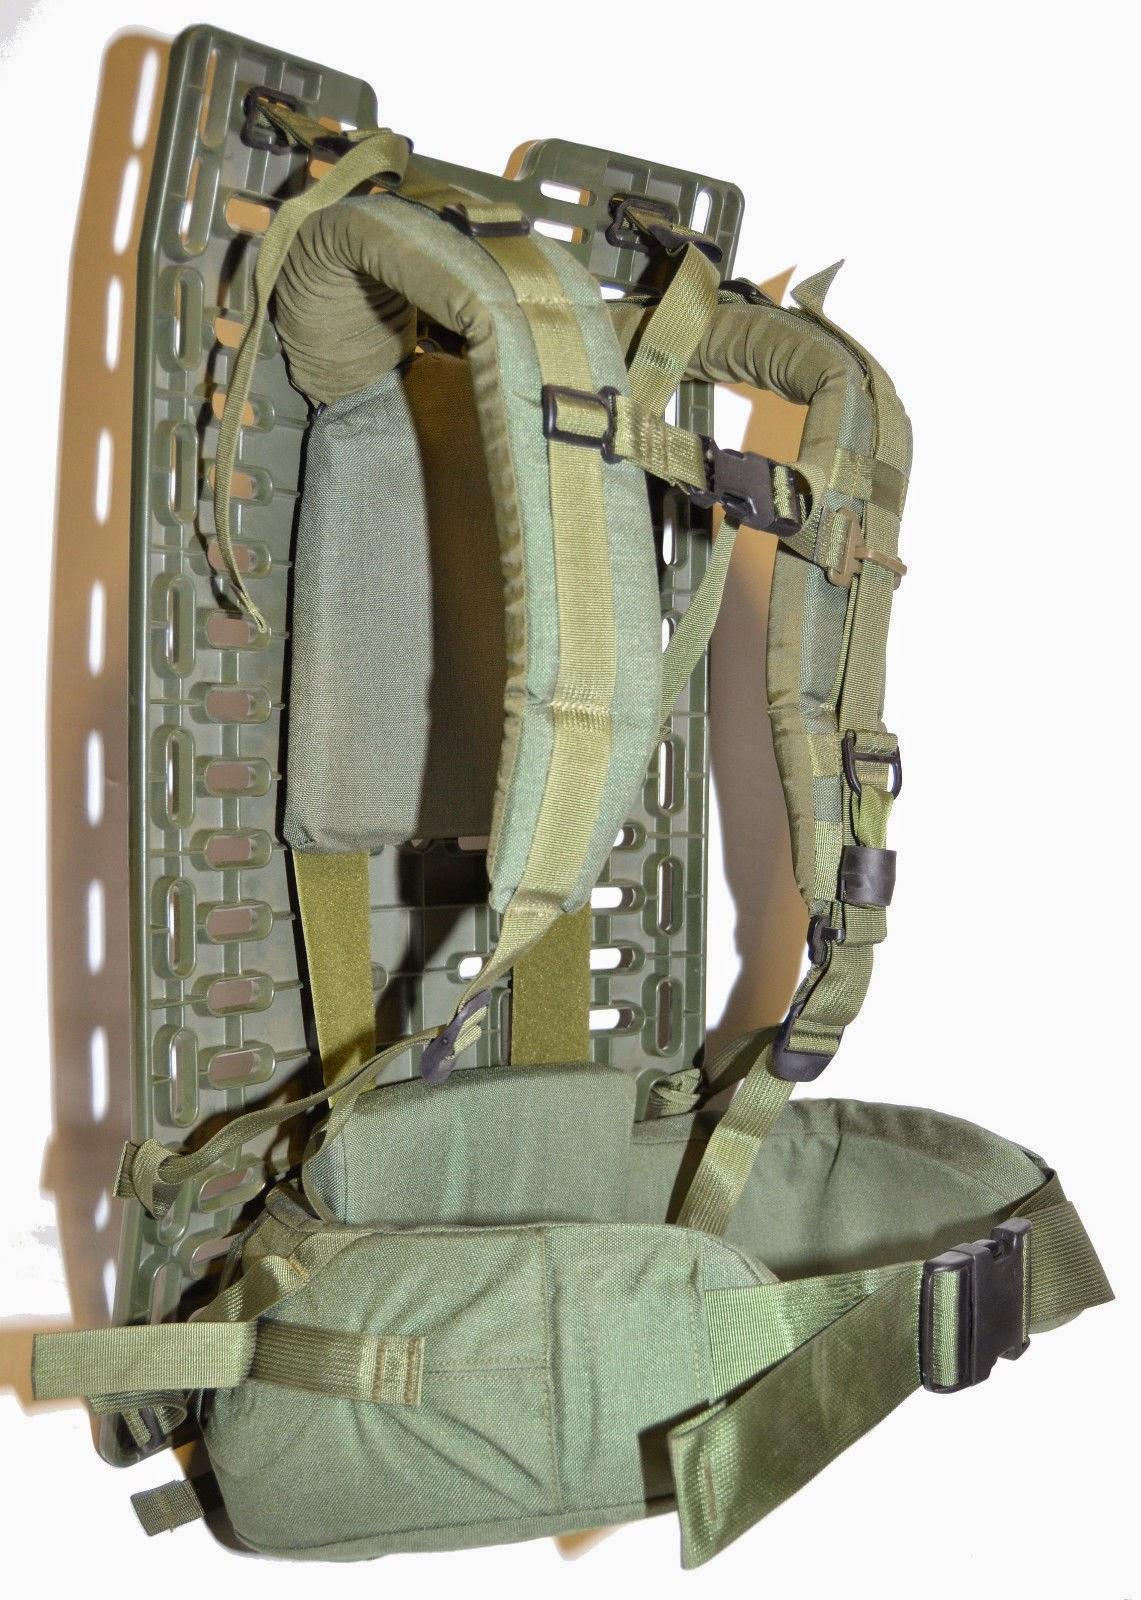 Webbingbabel Canadian Army Rucksack Cargo Pack Pack